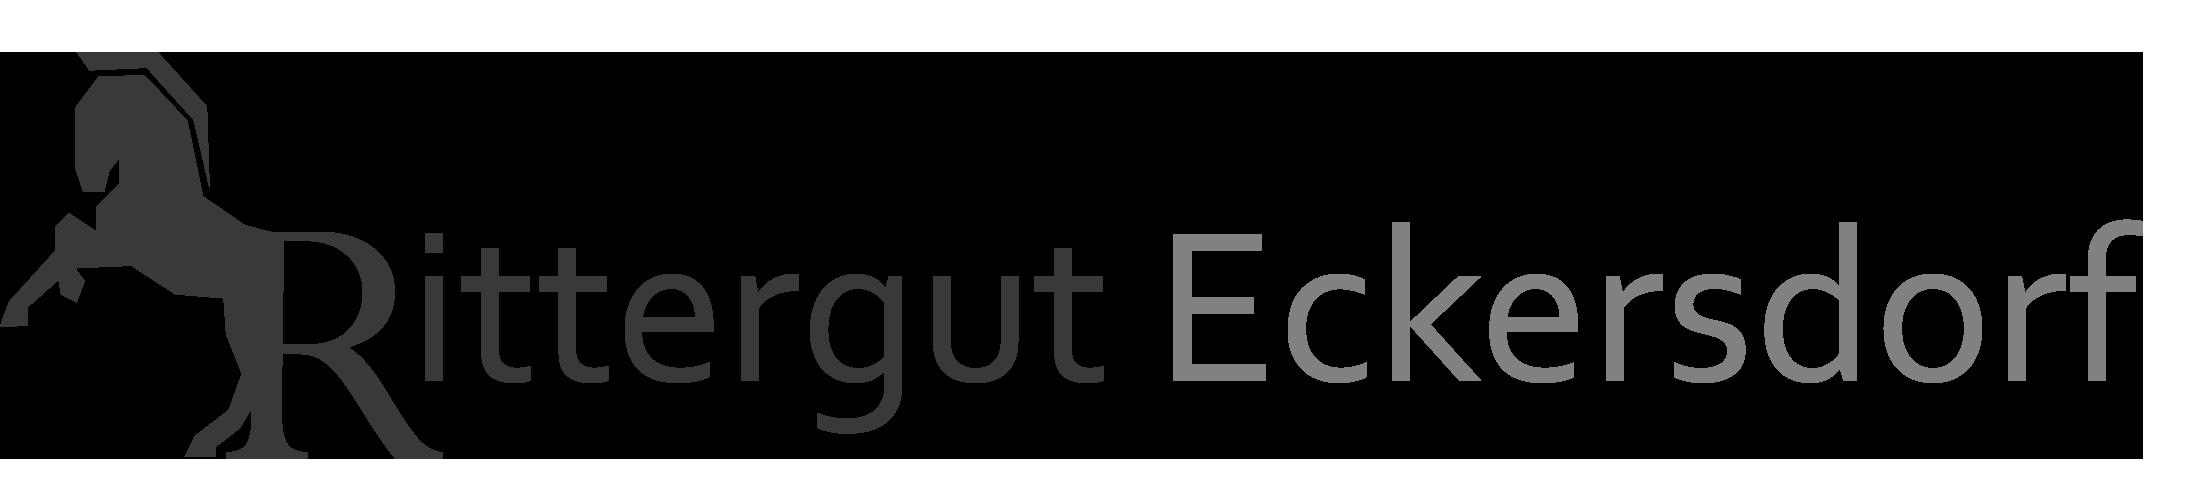 Rittergut Eckersdorf